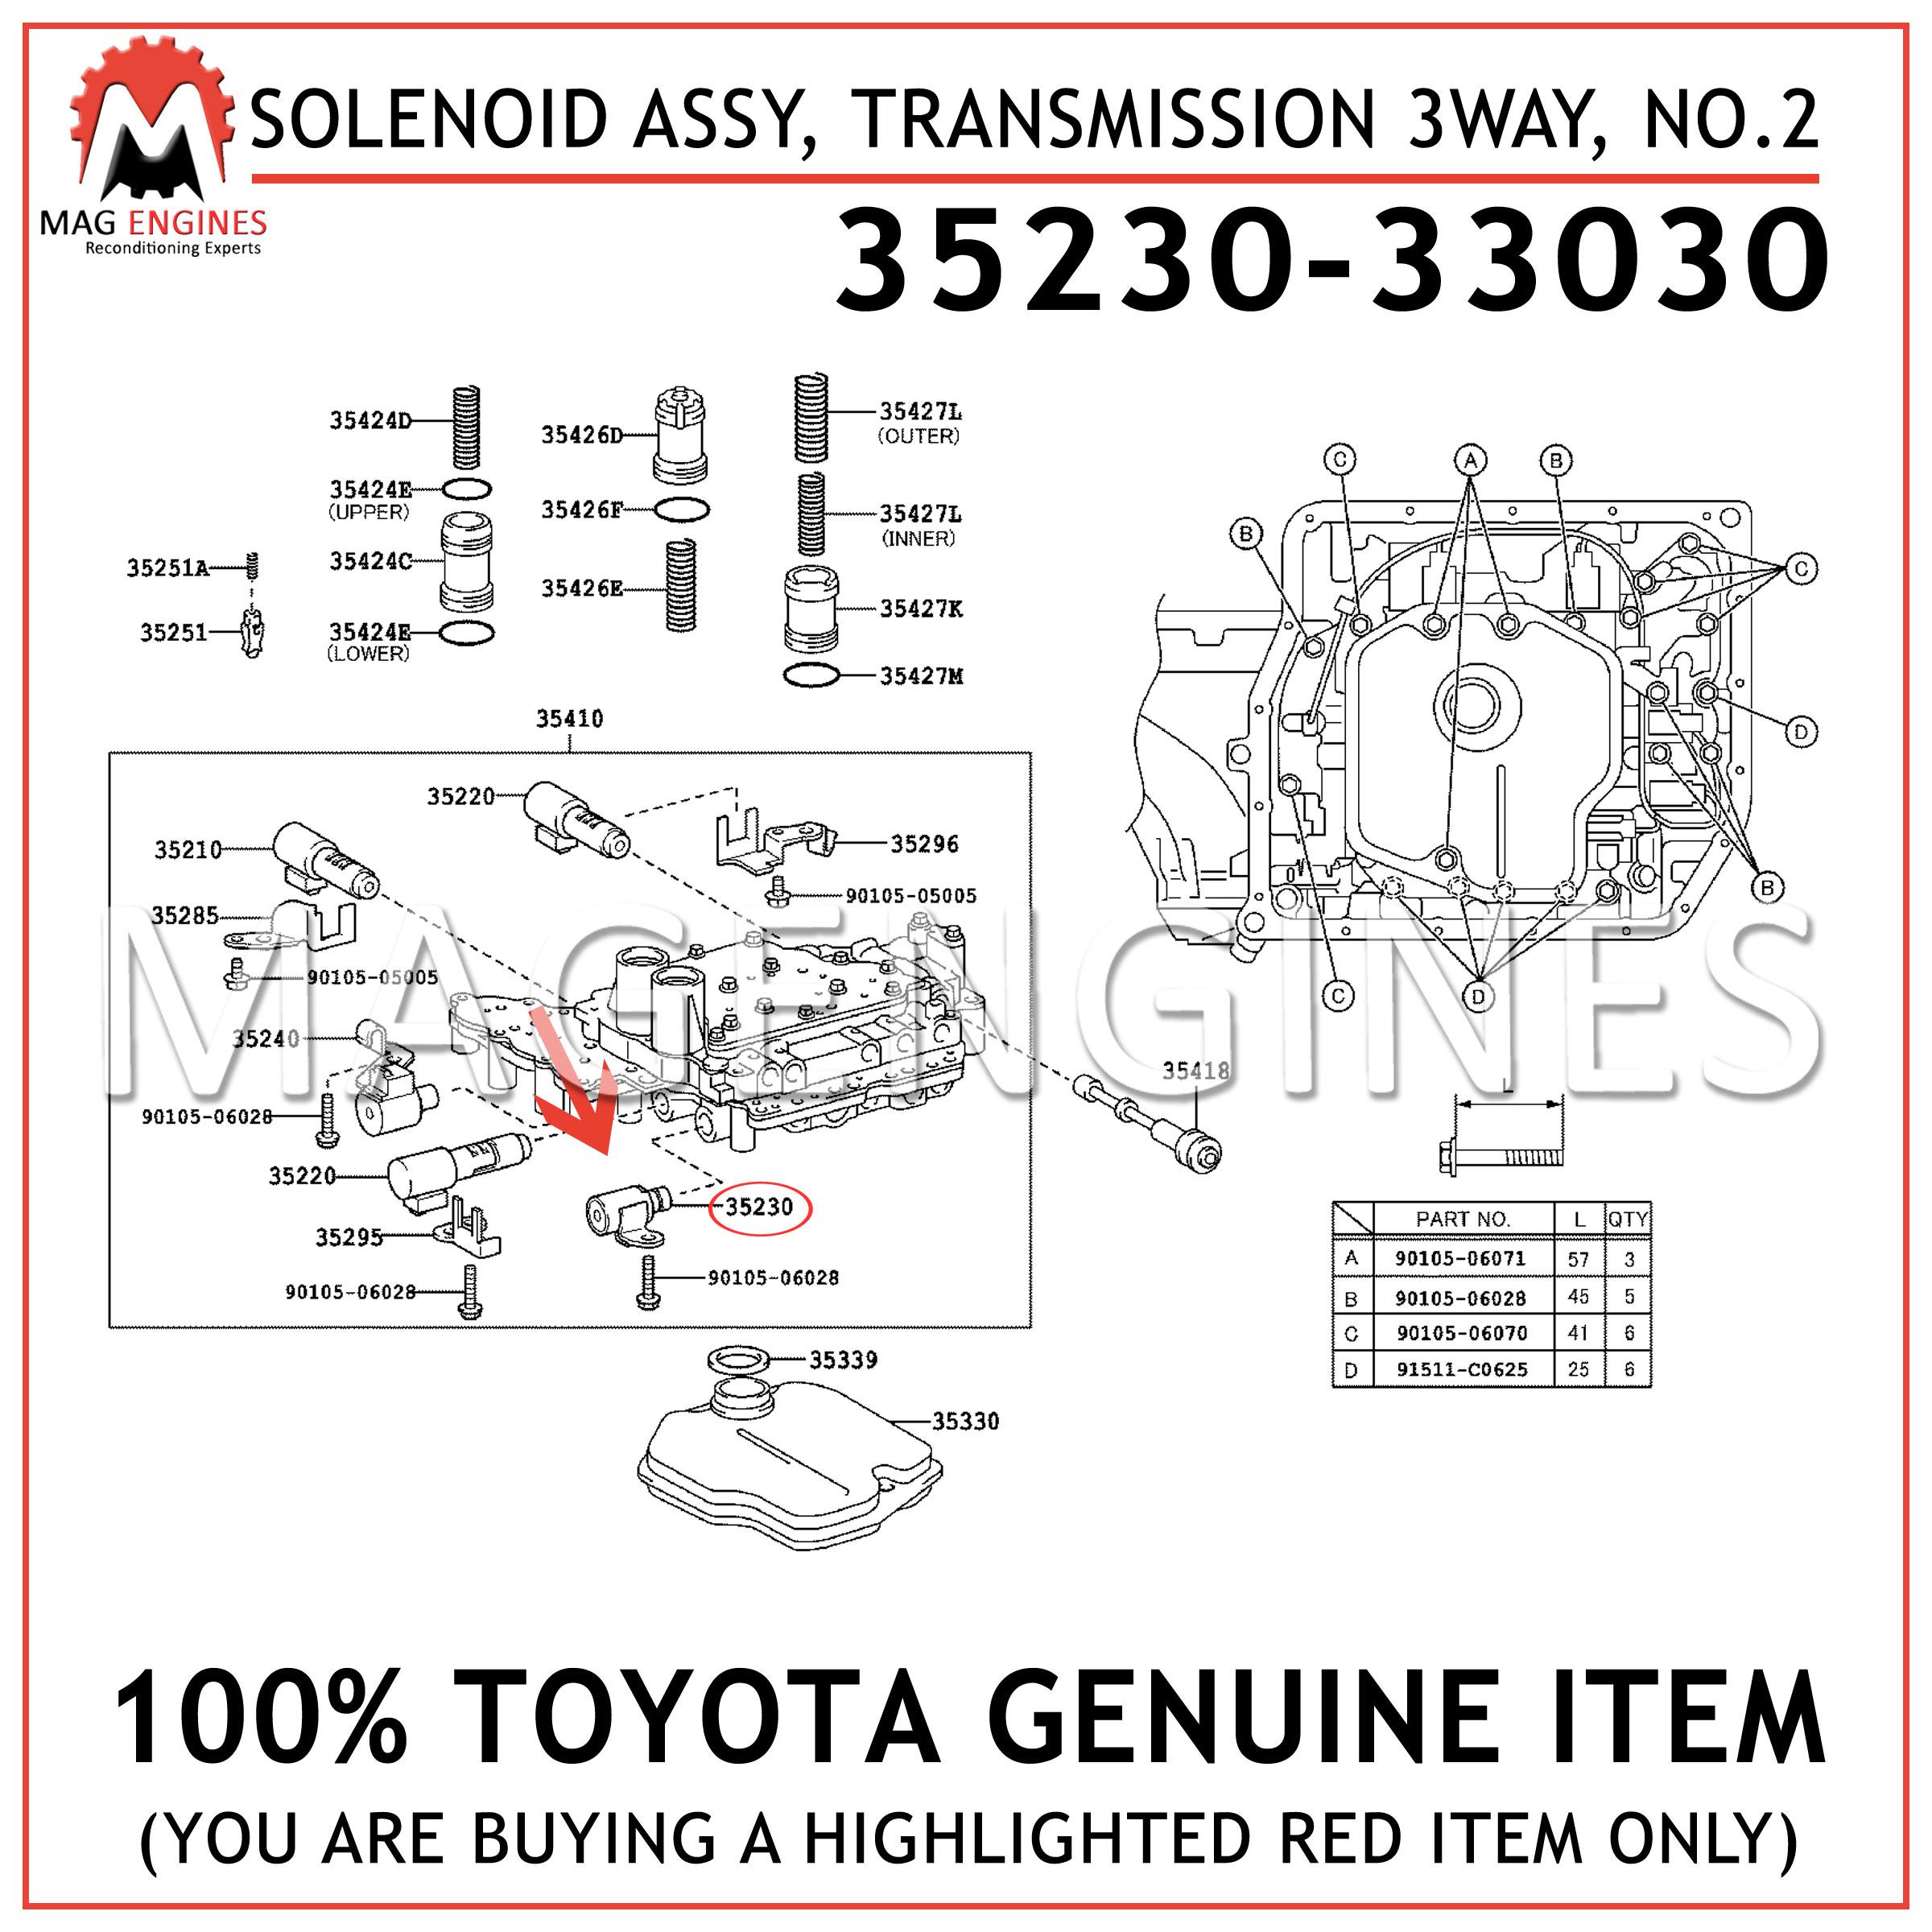 Genuine Lexus GS LS IS SC 35230-30010 3 Way Valve Transmission Solenoid No 2 OEM